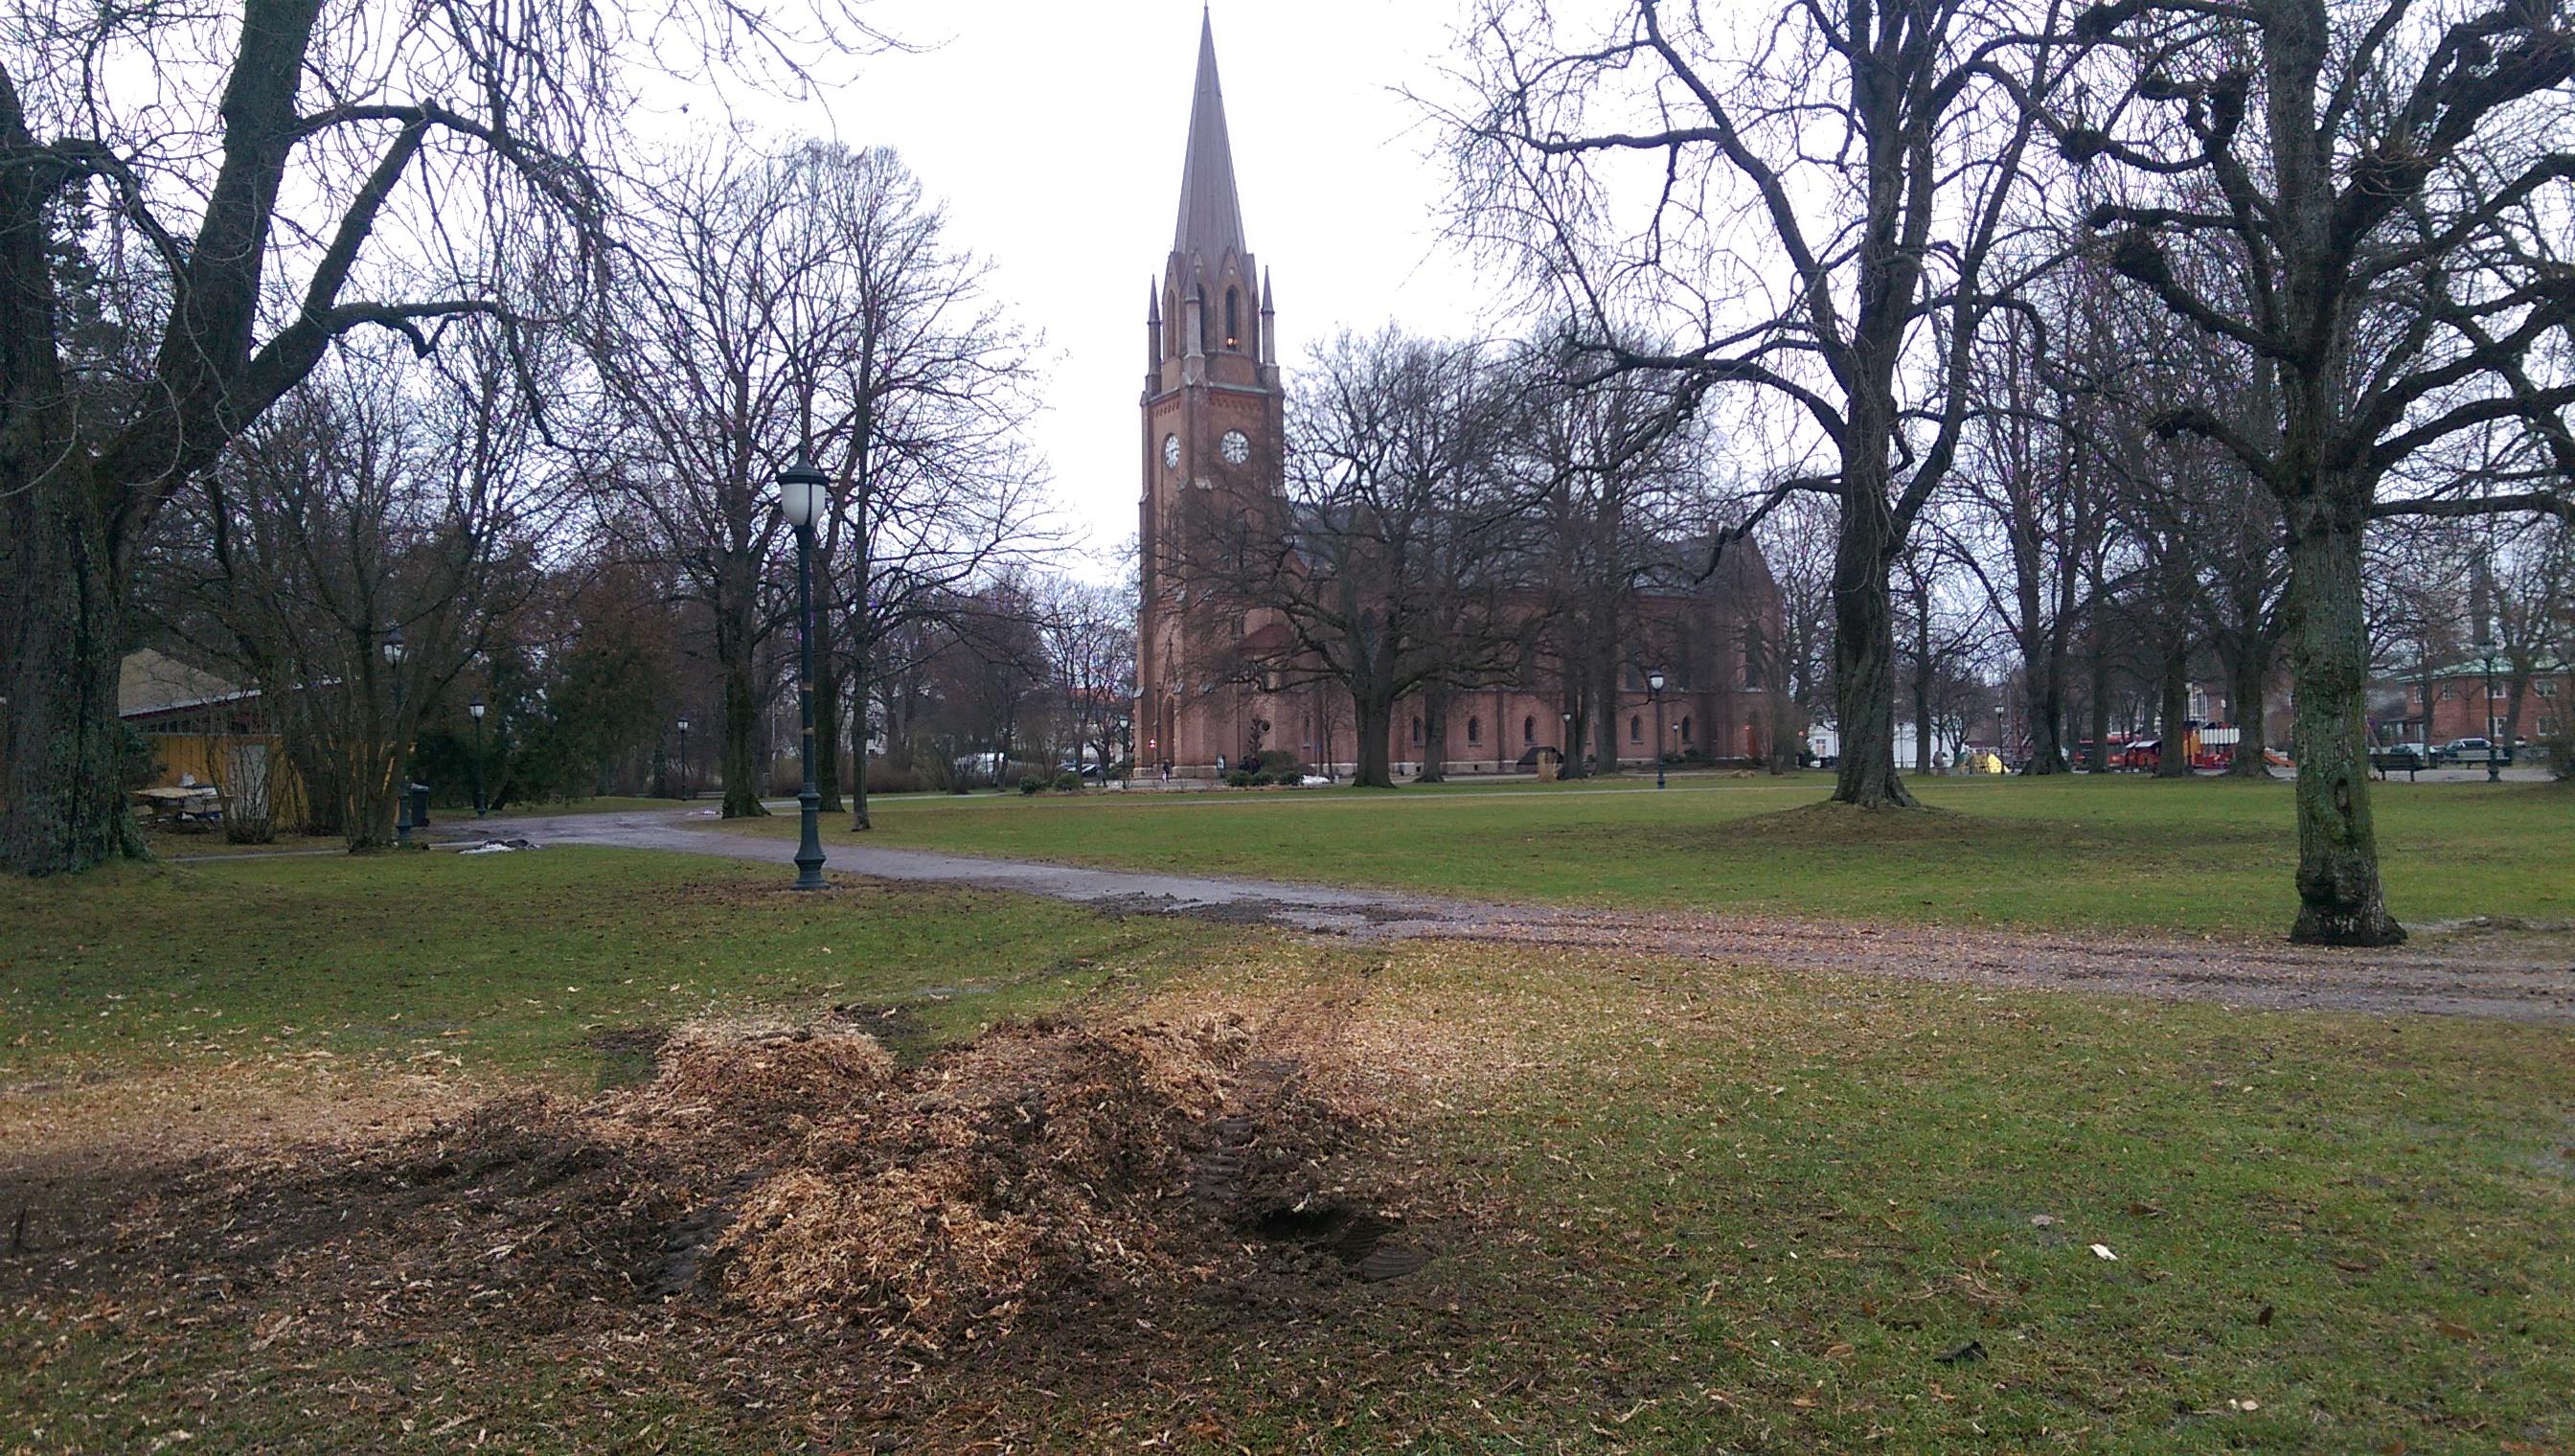 Domkirkeparken for Fr.stad kommune